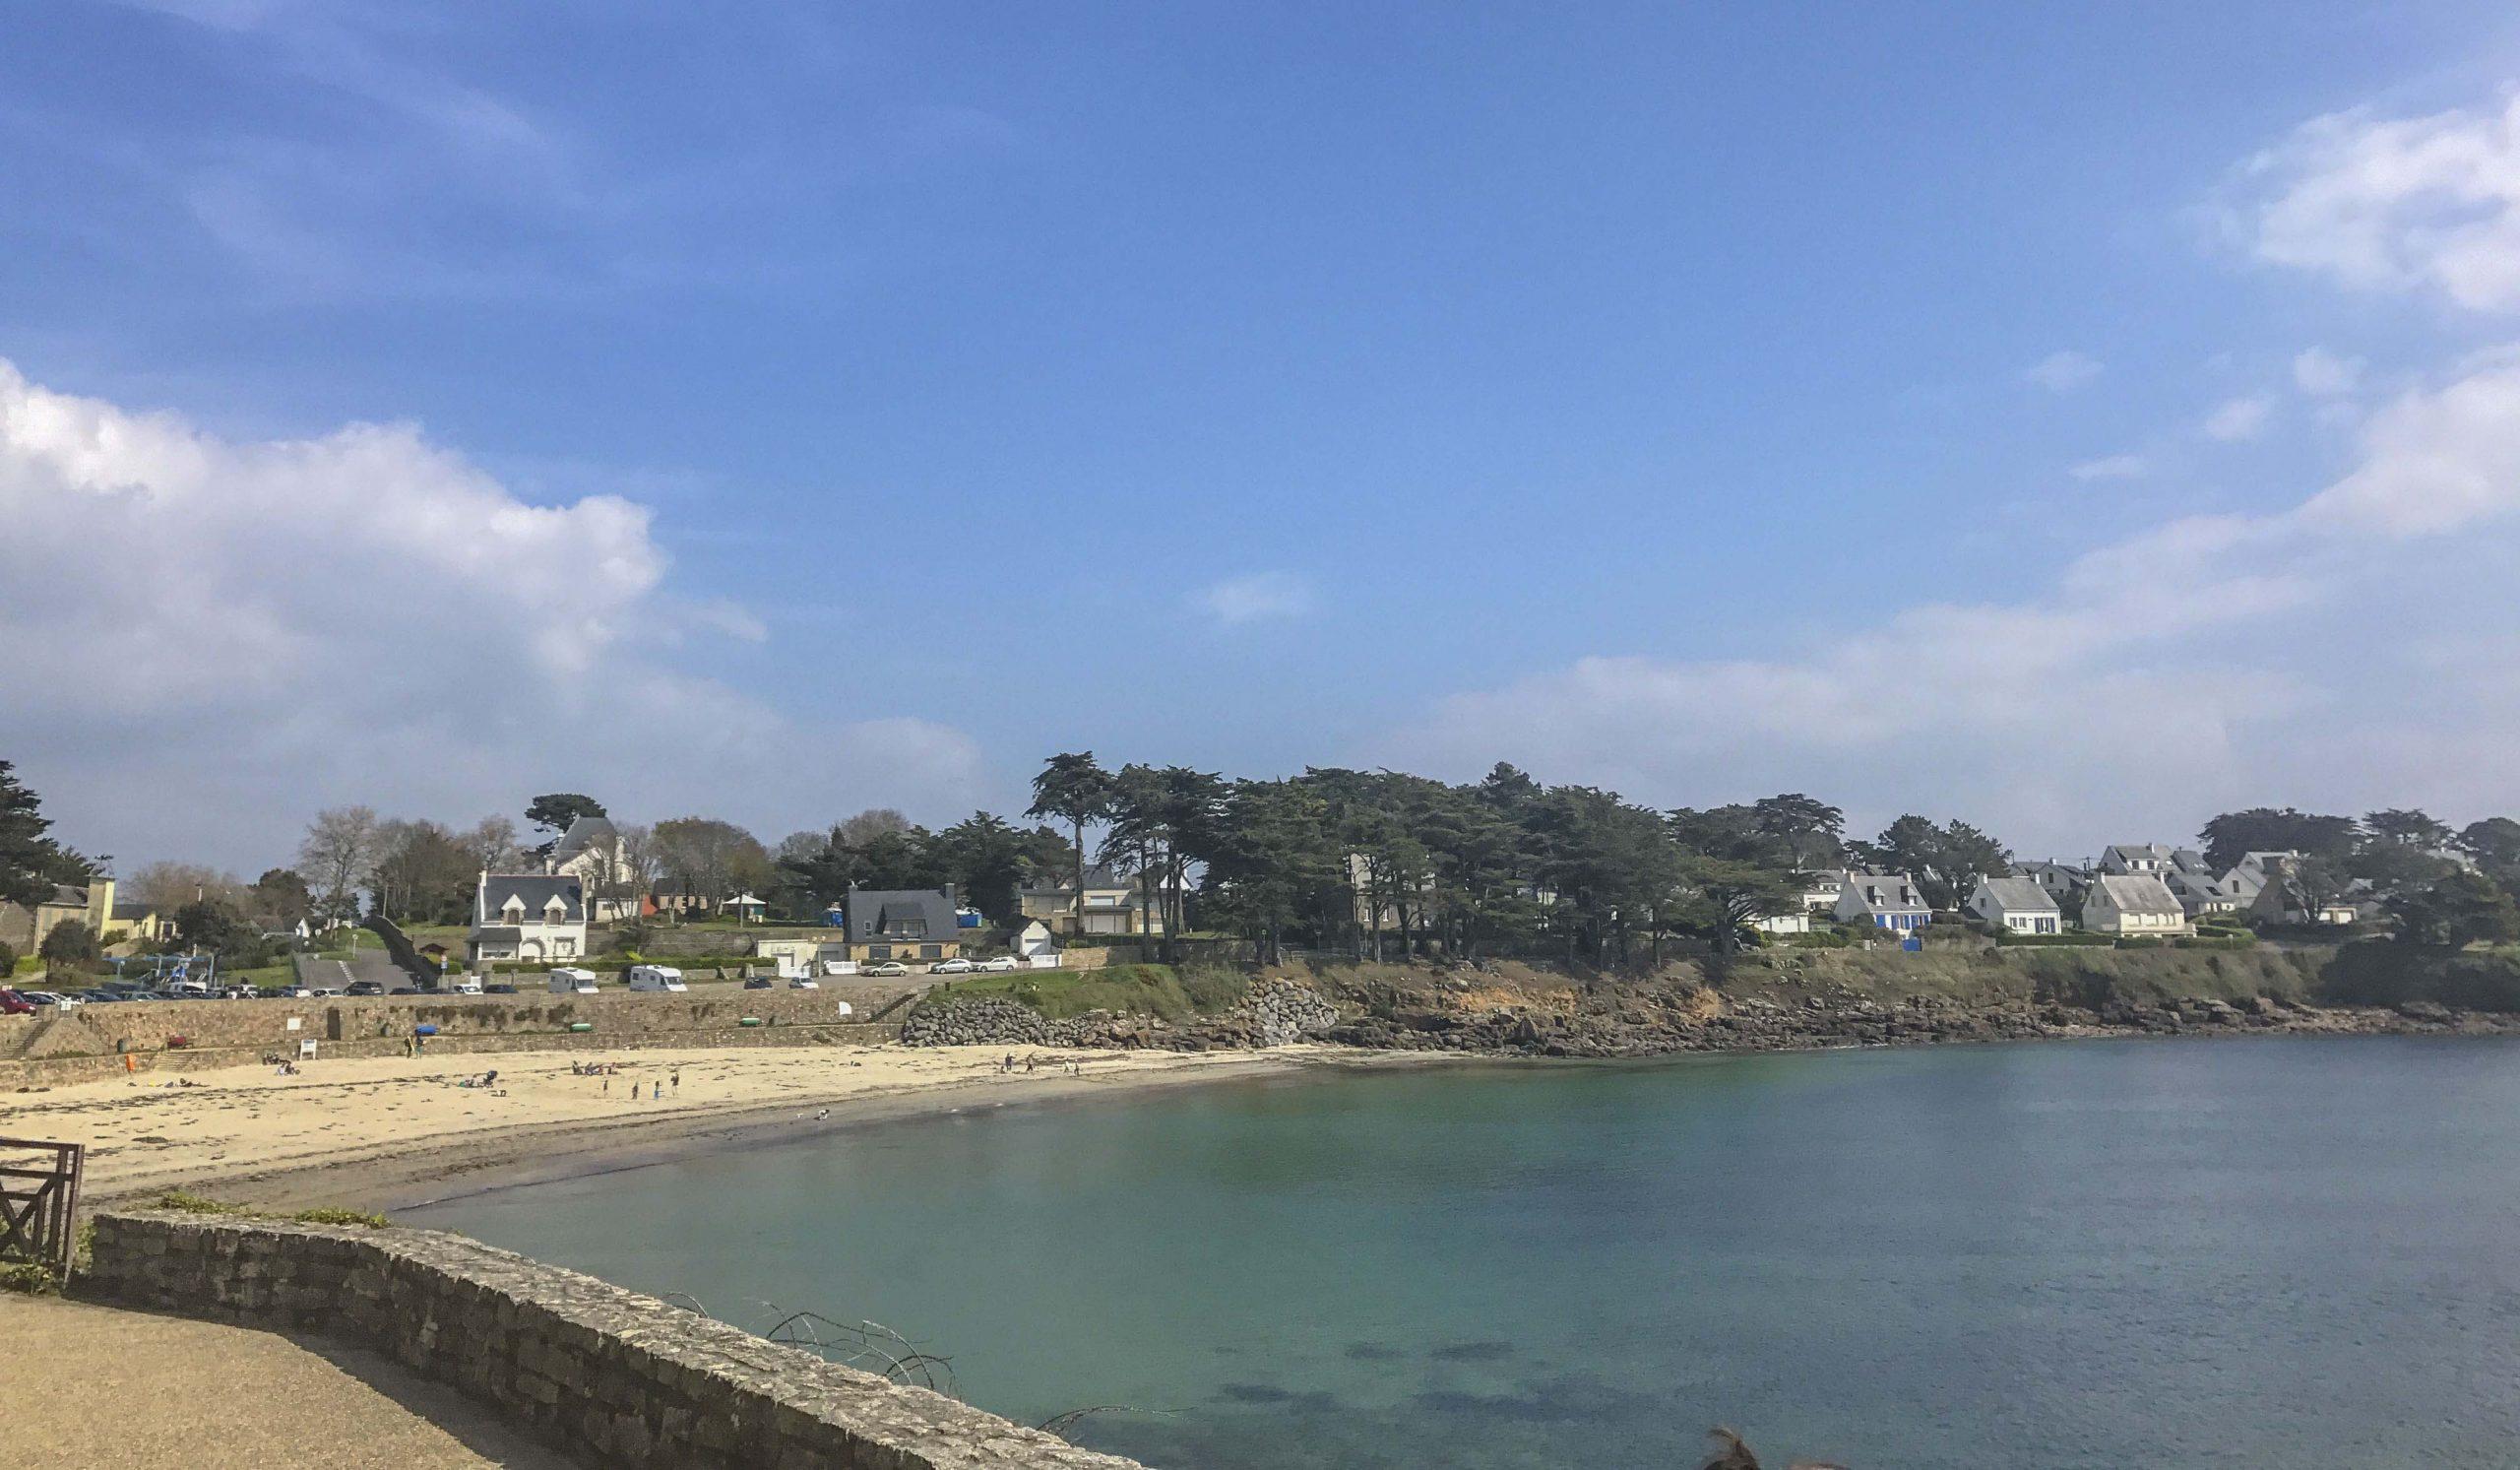 Camping Vannes, Golfe Du Morbihan | Camping Morbihan ... pour Camping Golf Du Morbihan Avec Piscine